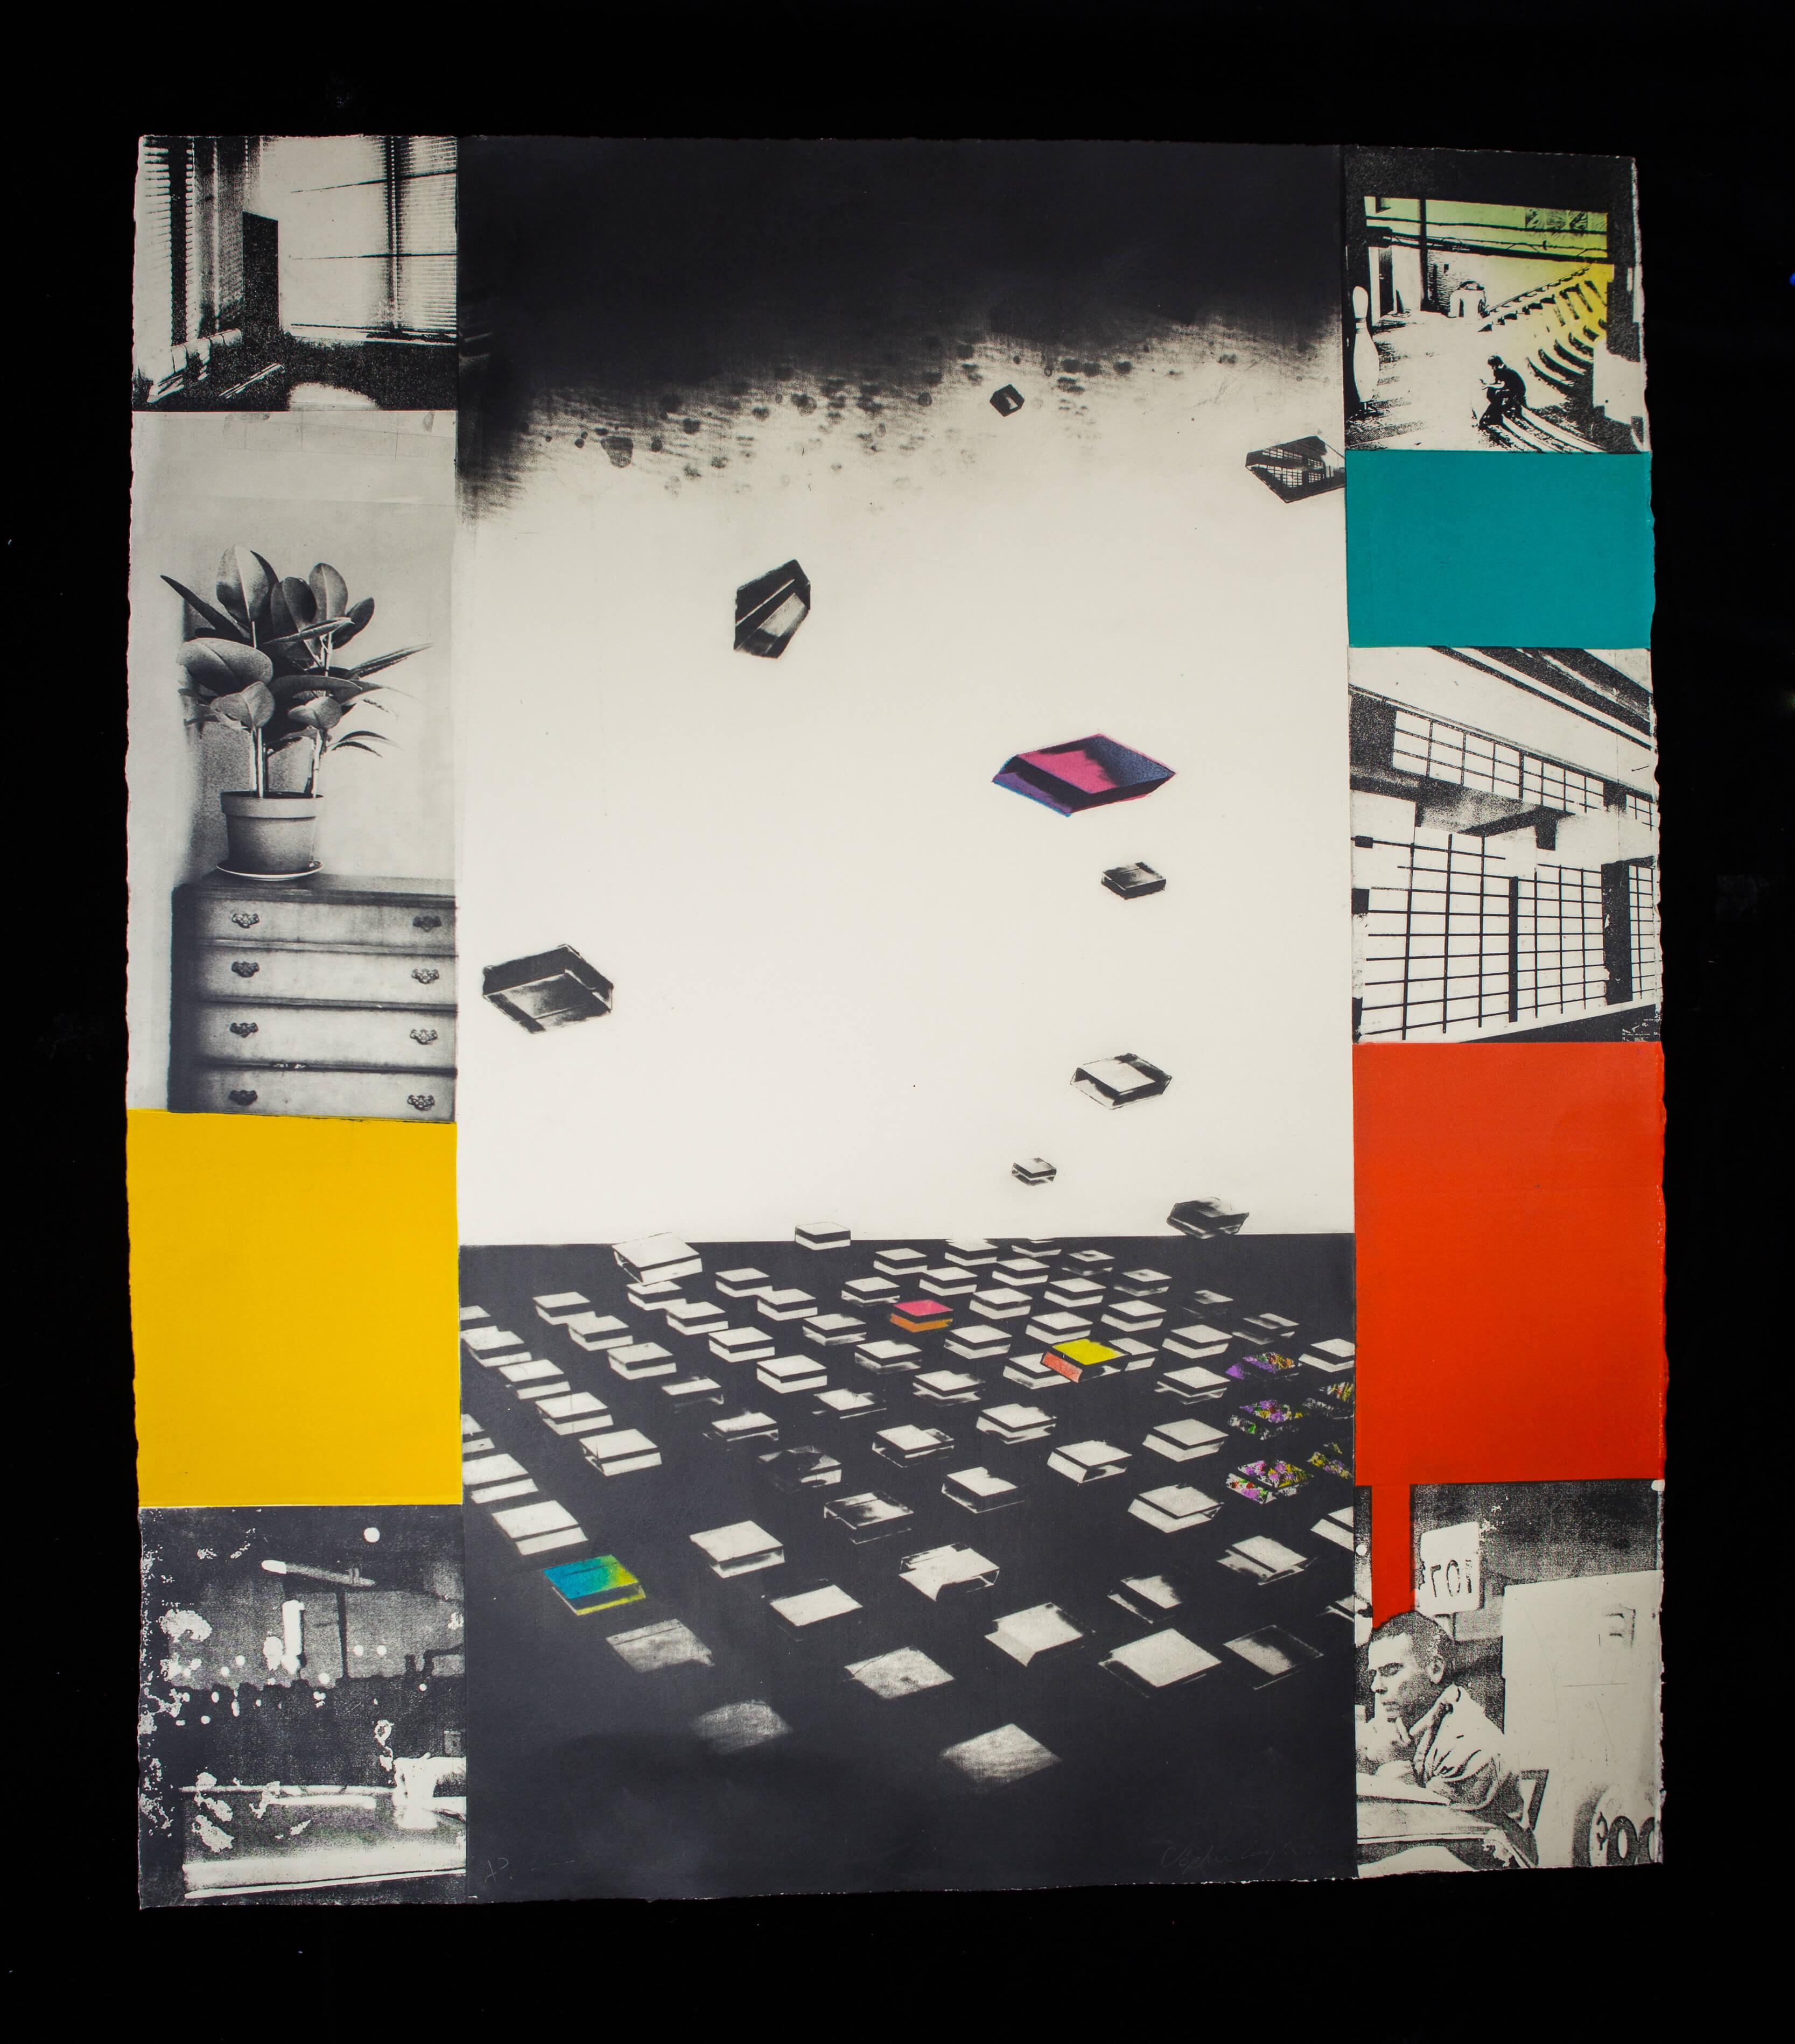 Counterbalance, 2015